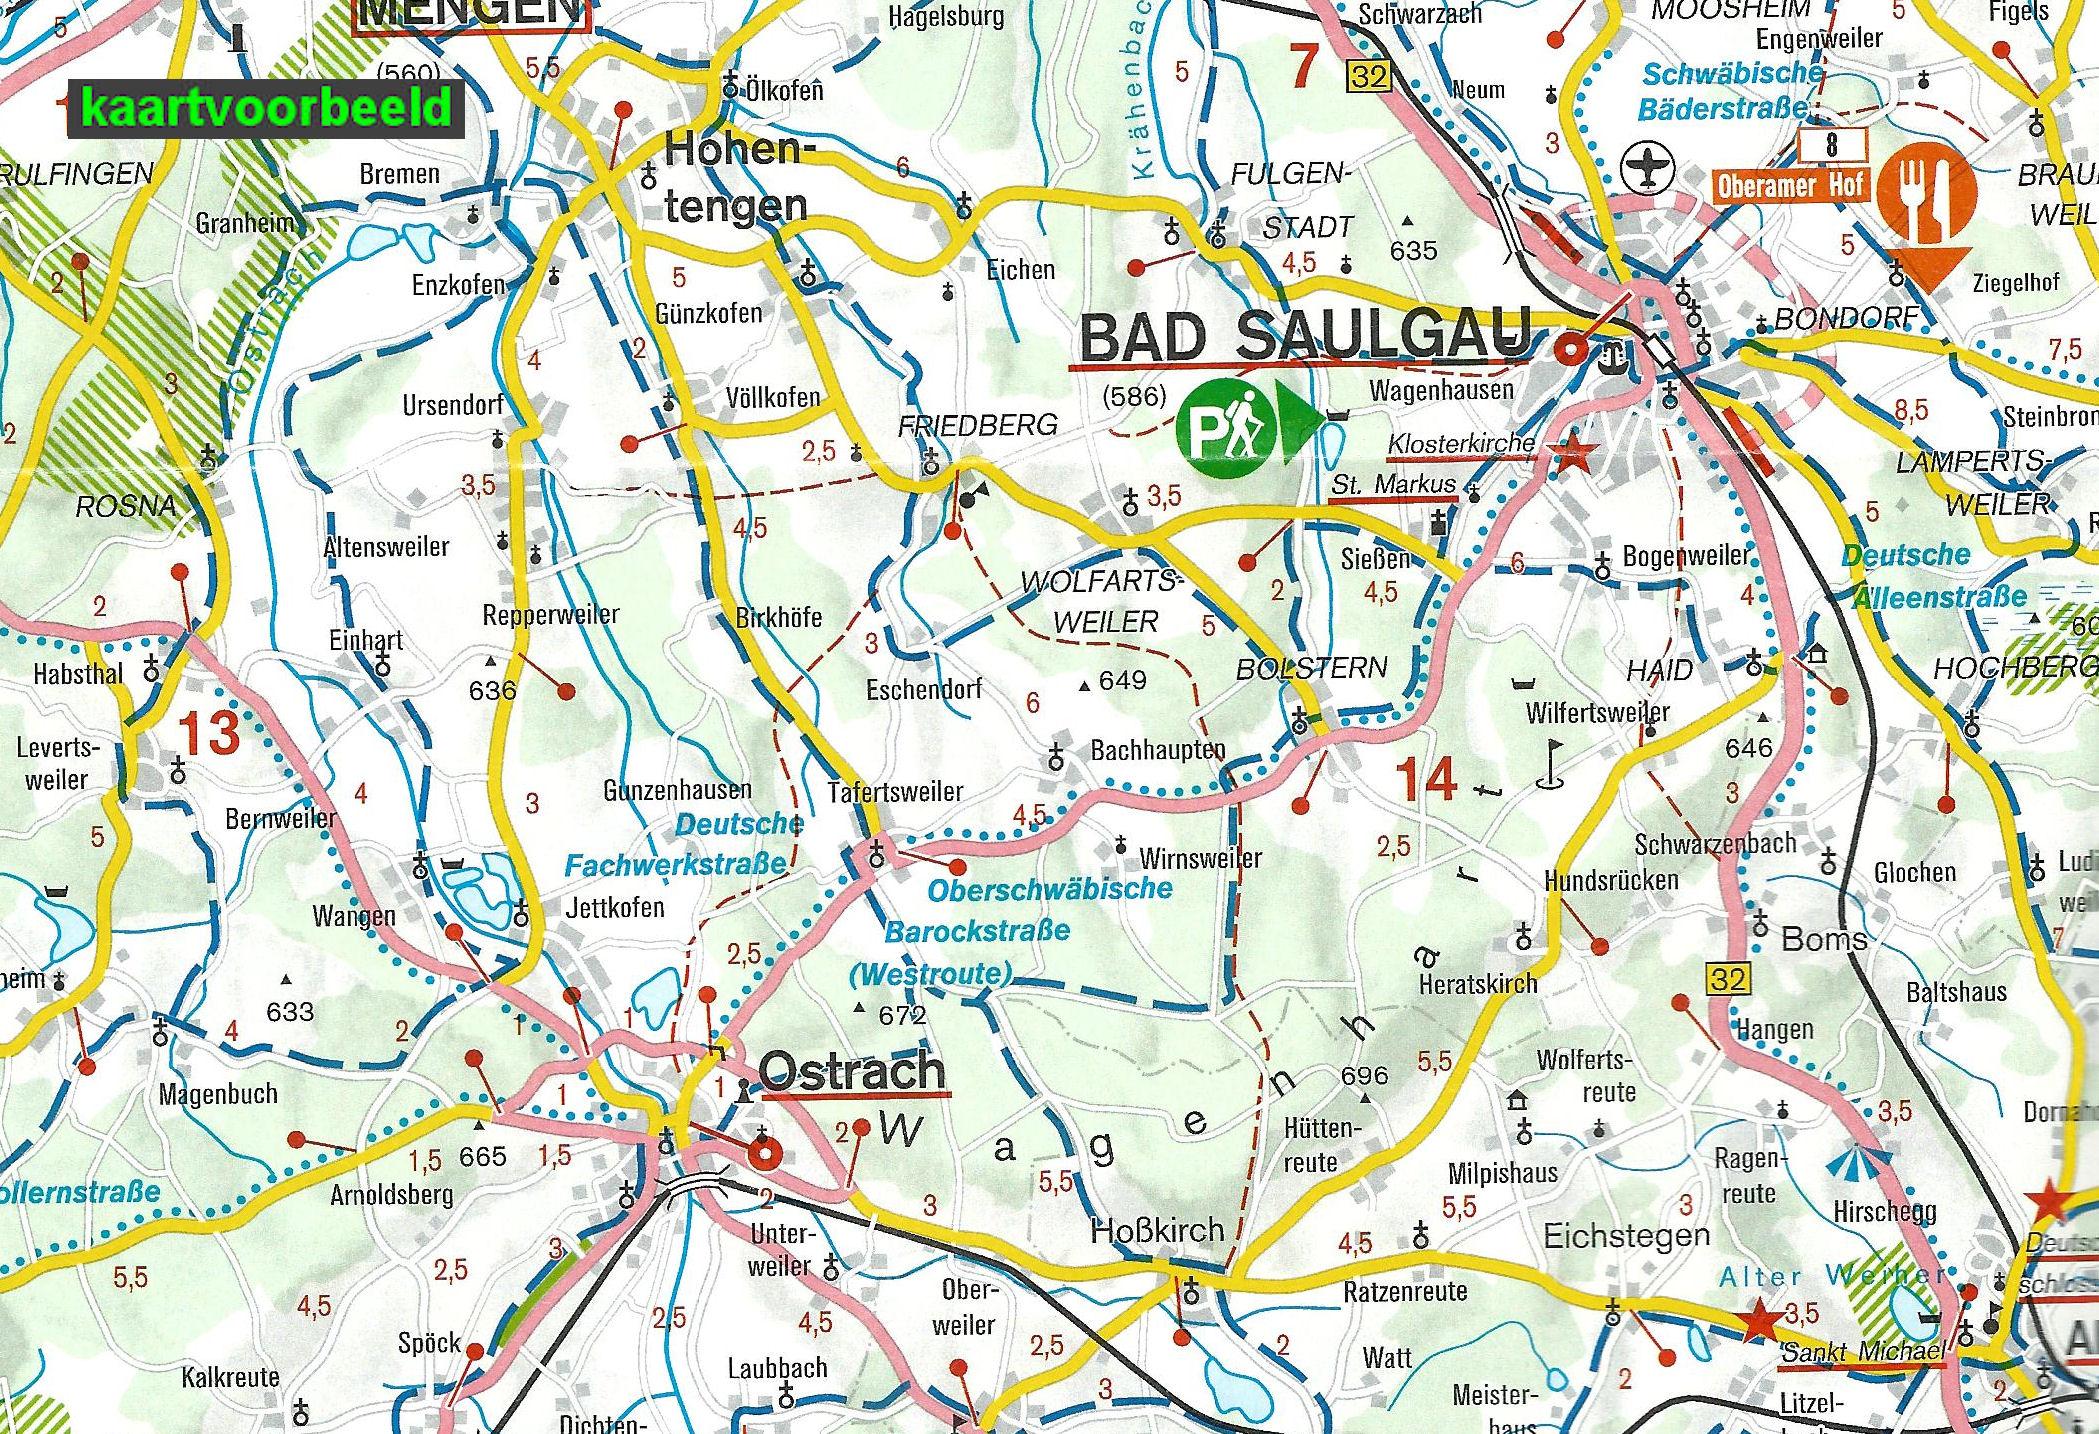 Wegenkaart Landkaart 40 Freizeitkarte Schwarzwald Sud Zwarte